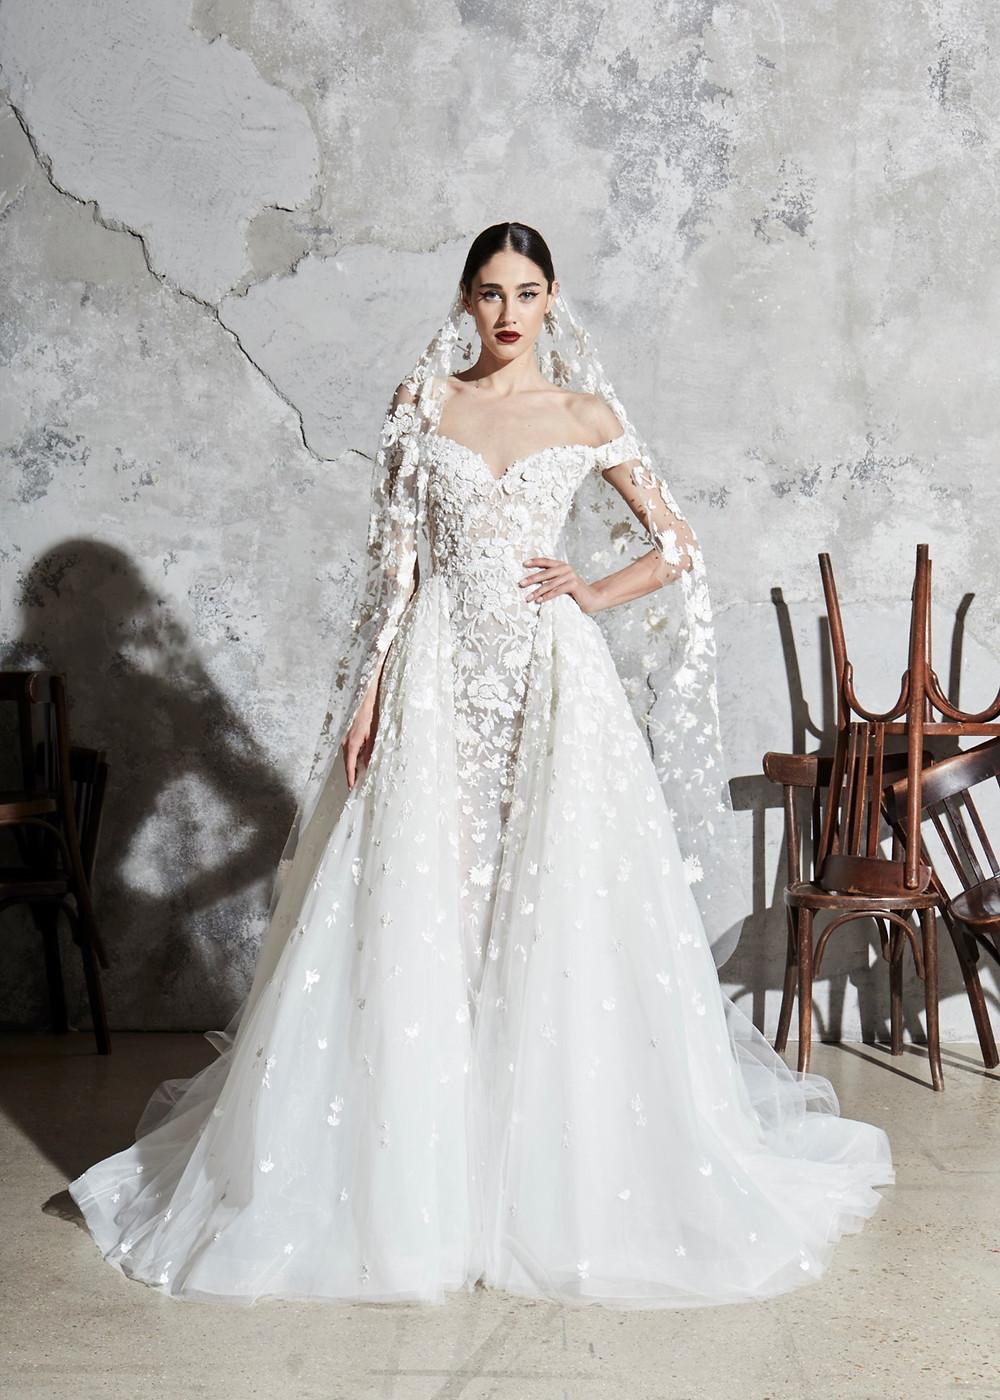 Weddinspired | 50+ Detachable Skirt Wedding Dresses | Zuhair Murad from the Spring 2020 collection